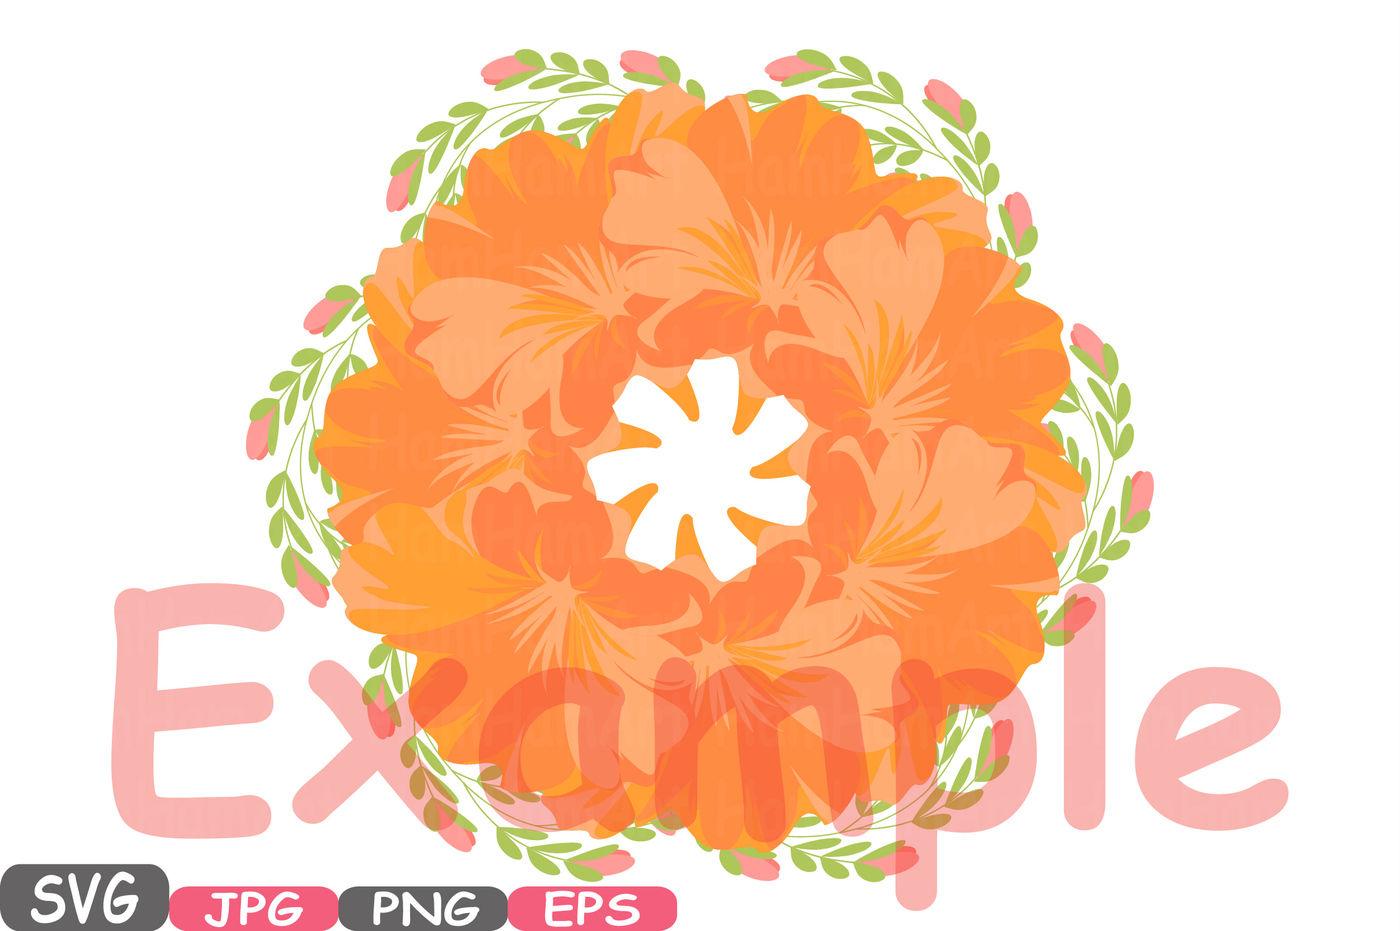 Wedding Flowers Vintage Floral Invitation Cutting Files Svg Eps